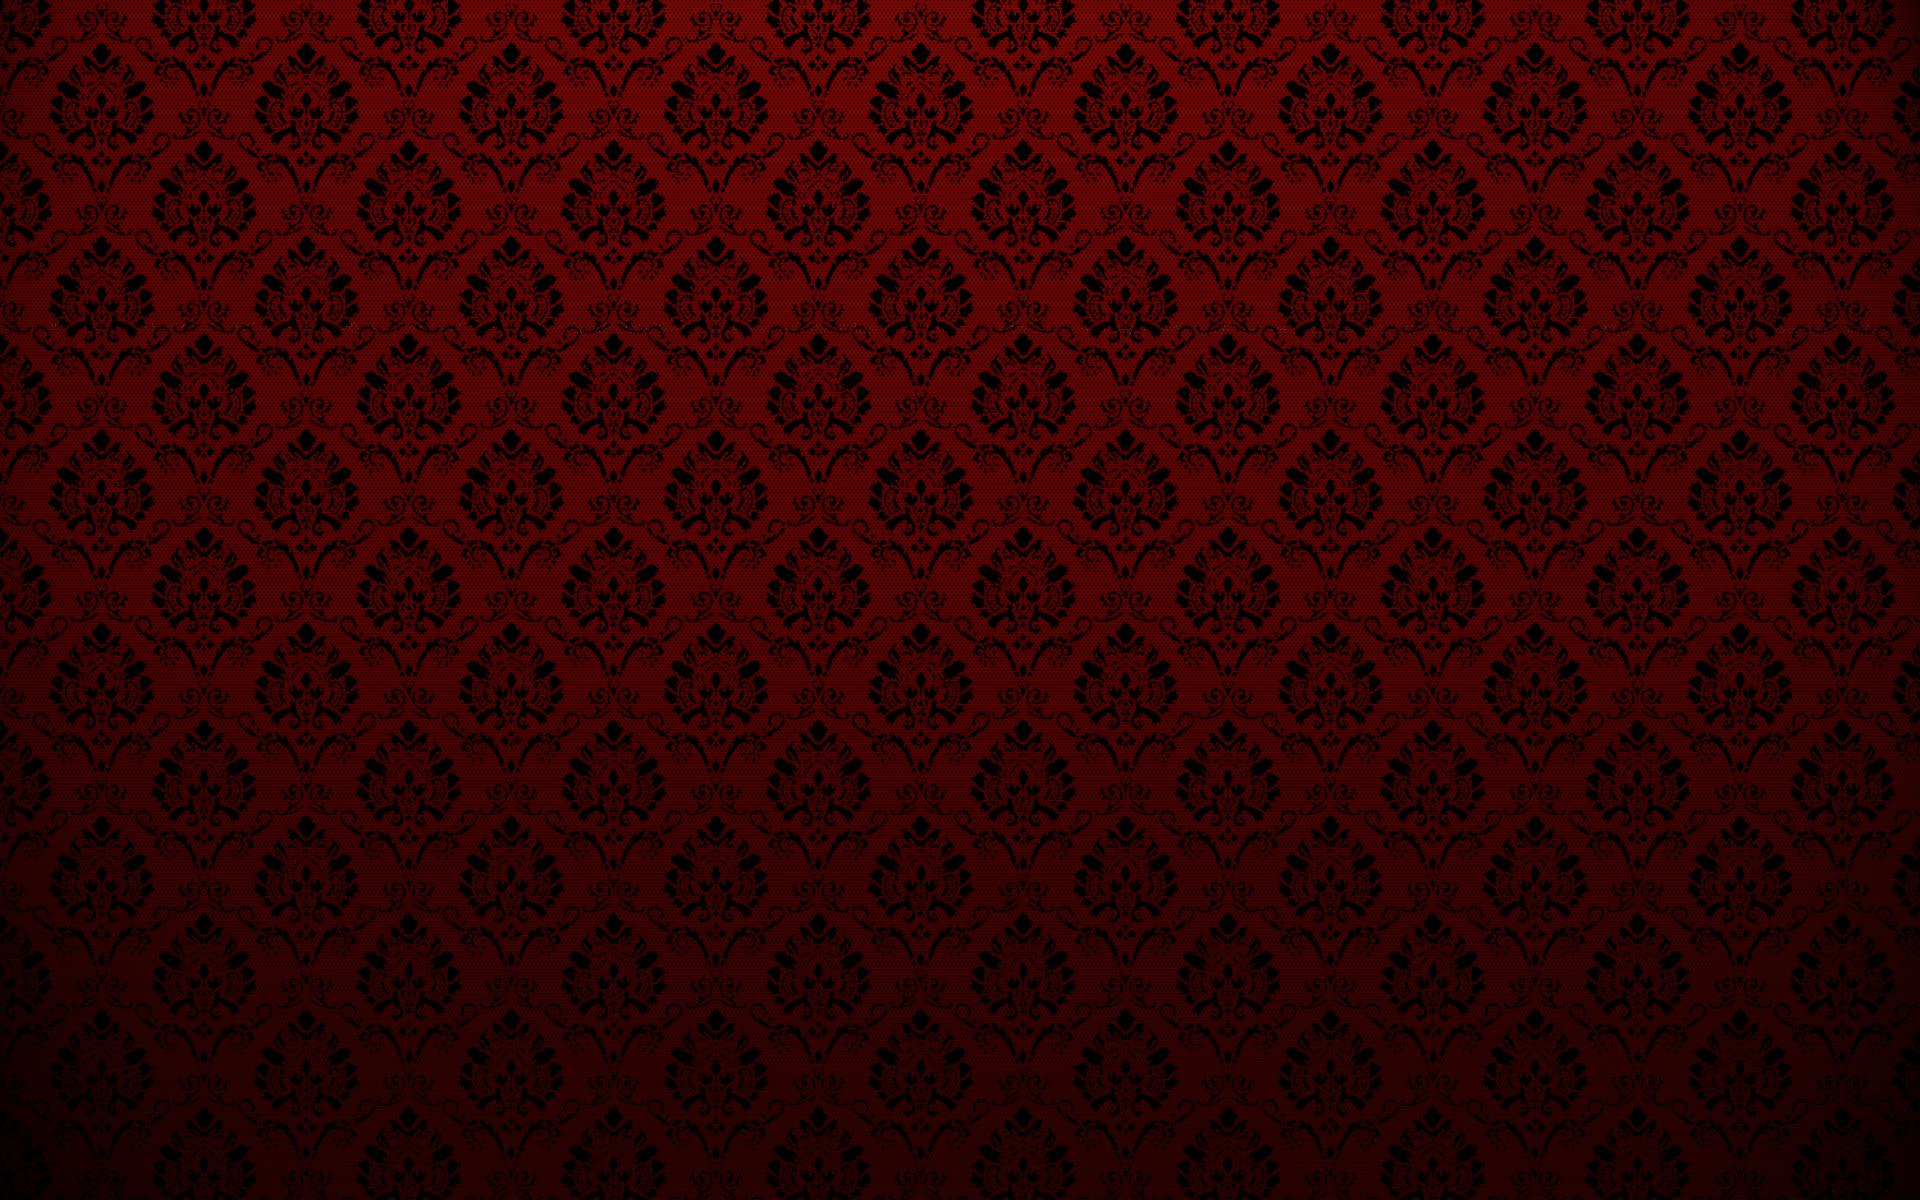 Wallpaper Texture Red Paper Media Details Burgundy Kertas